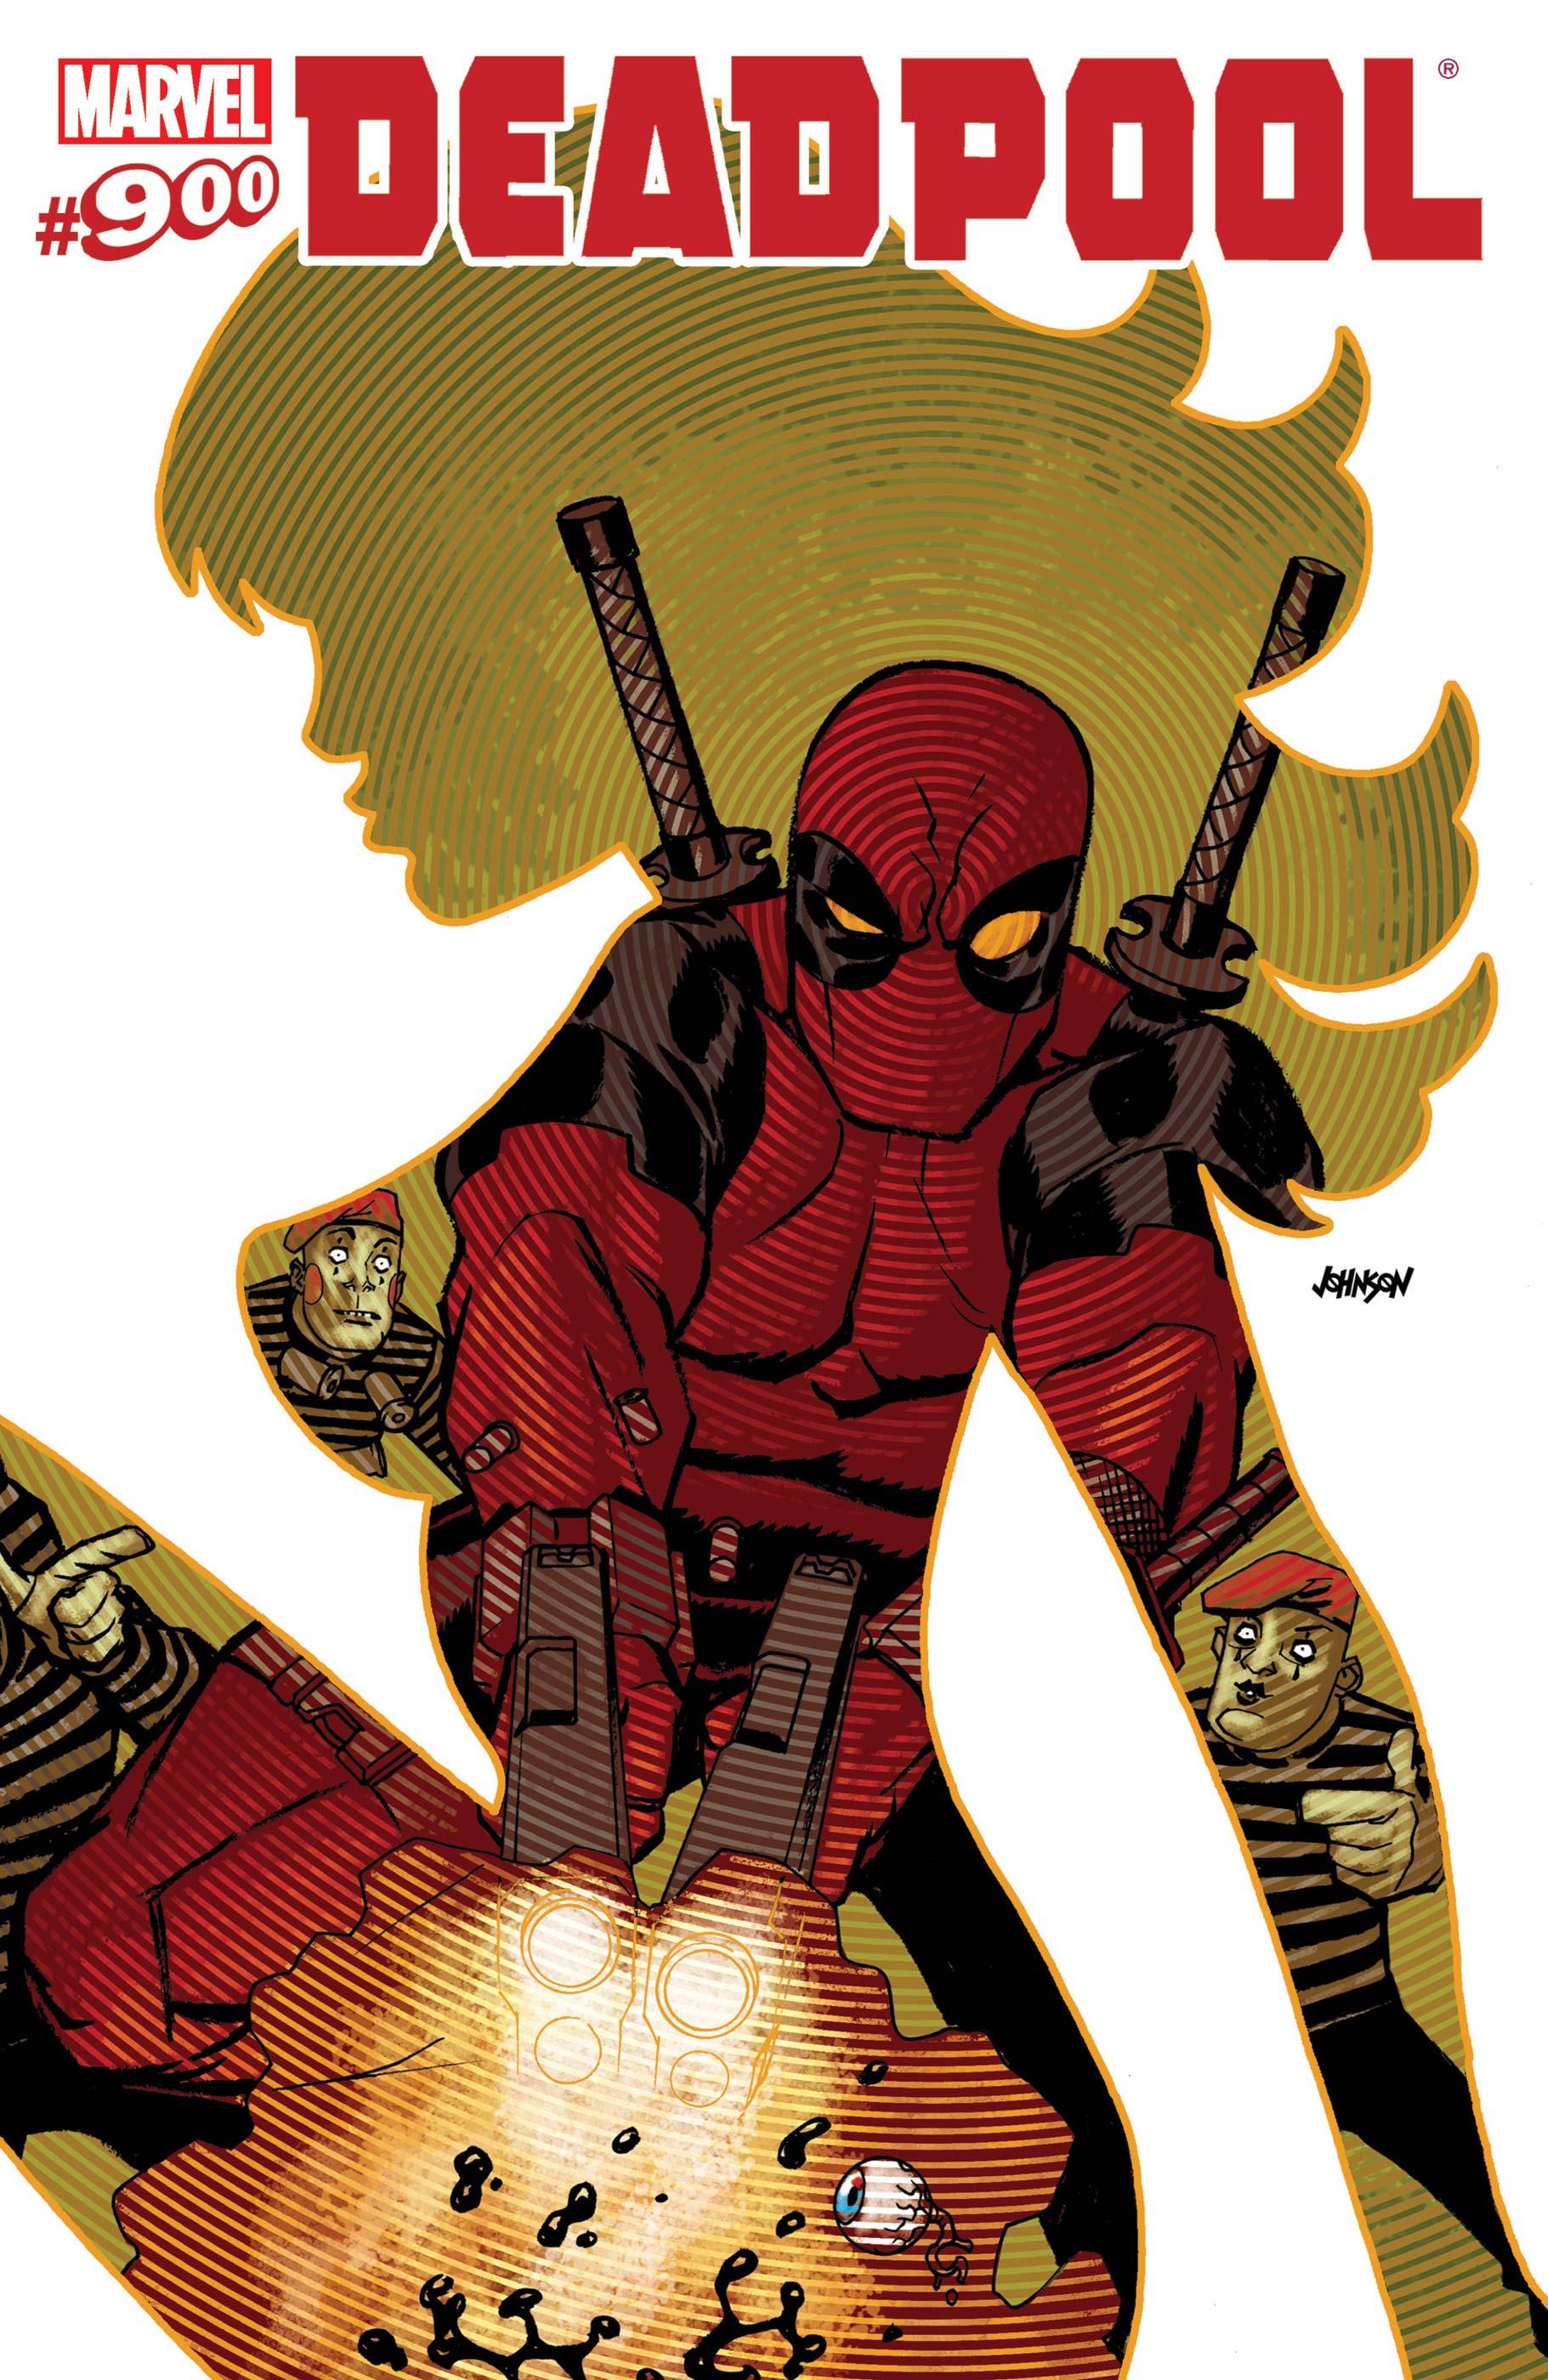 Deadpool Team-Up (2009) #900